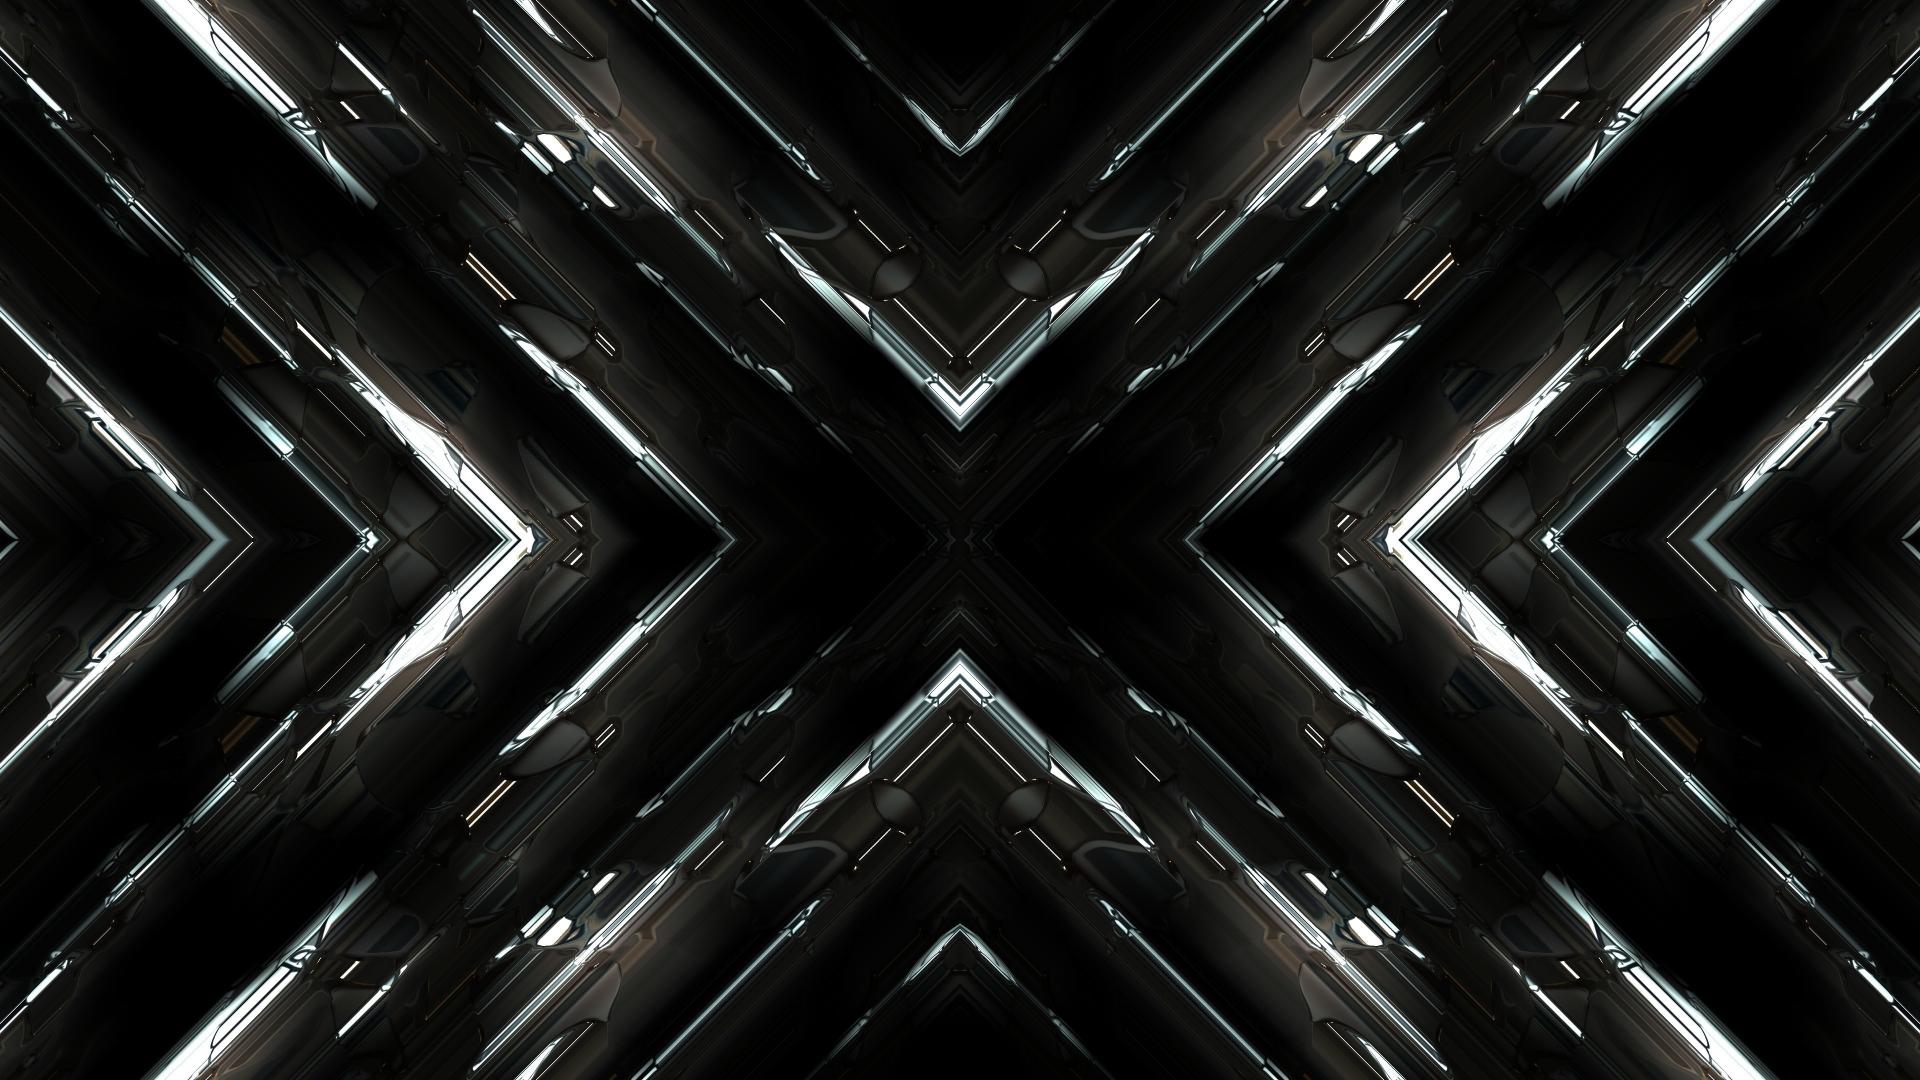 Hd Fractals Wallpapers 1080p: Download 1920x1080 Wallpaper Fractal, Dark, Abstract, Full